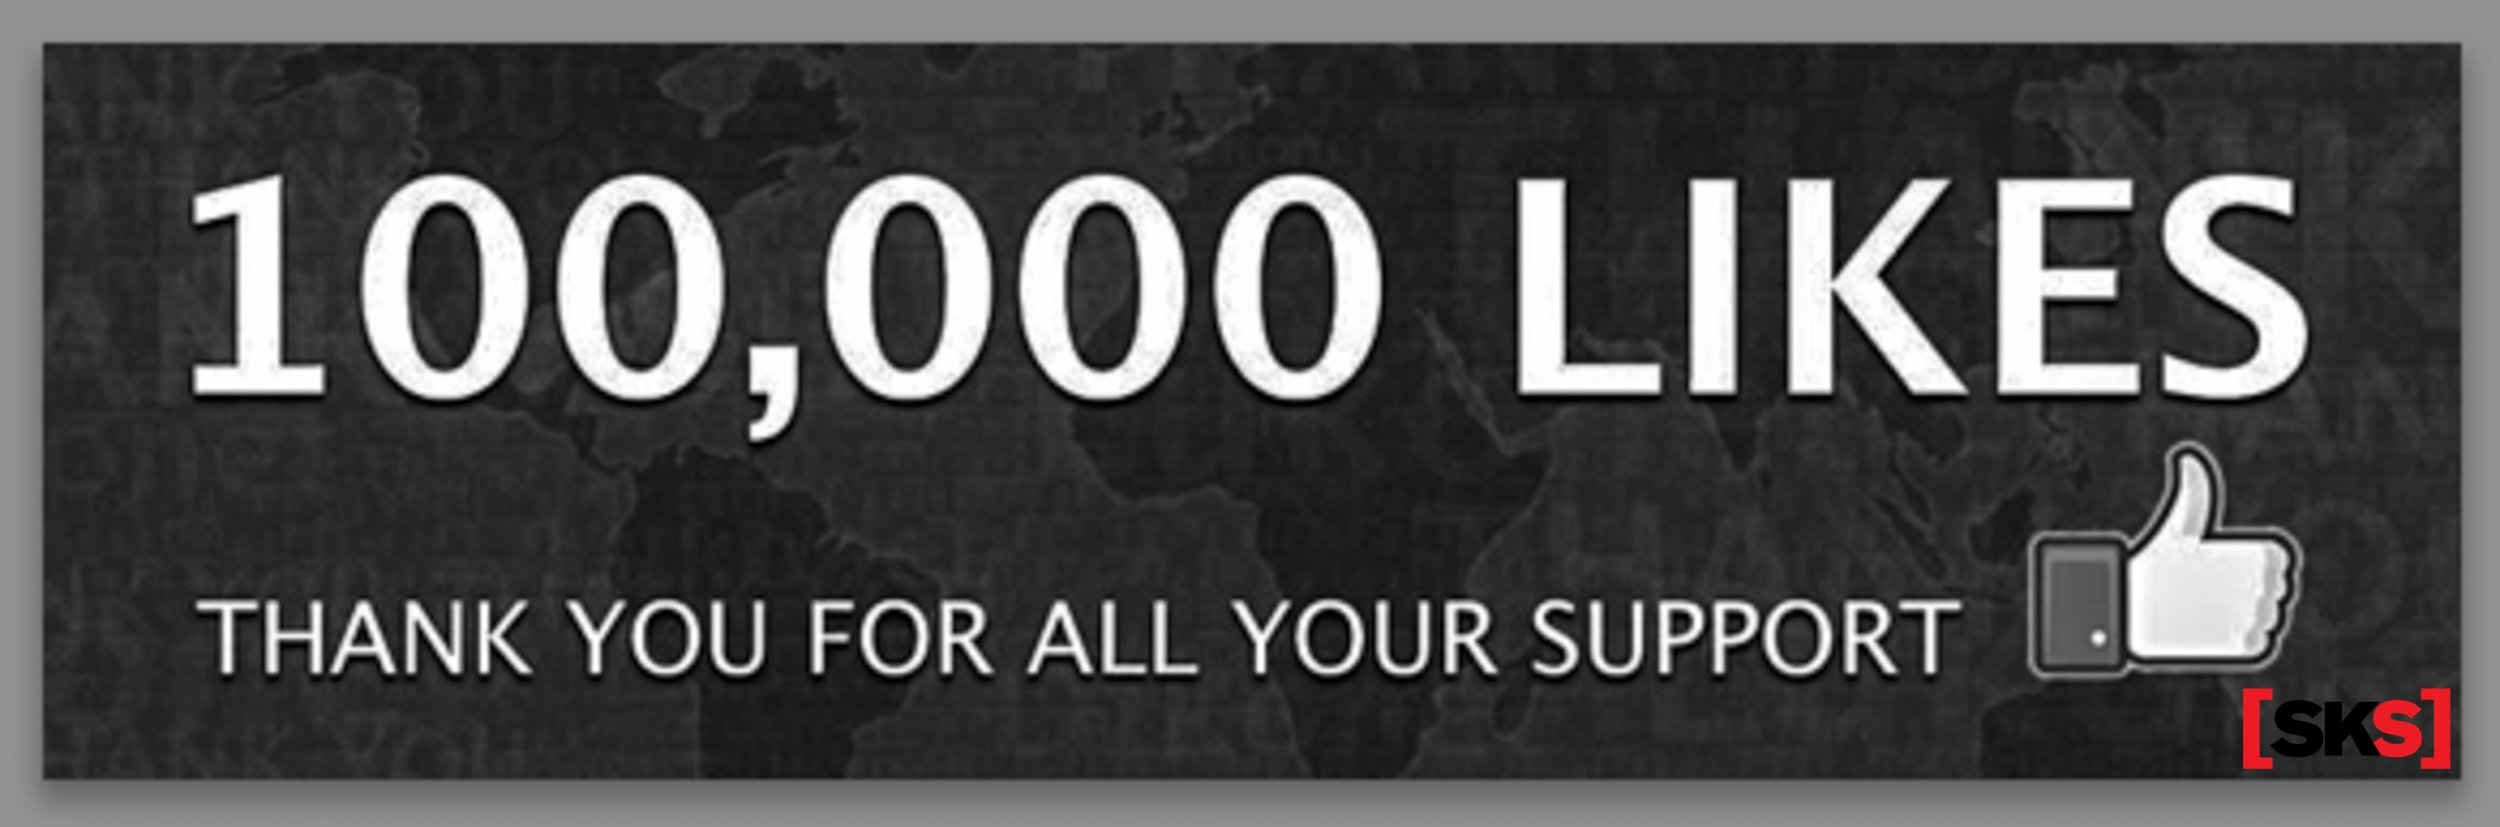 100,000 Likes FROM SKATESLATE BIG-.jpg